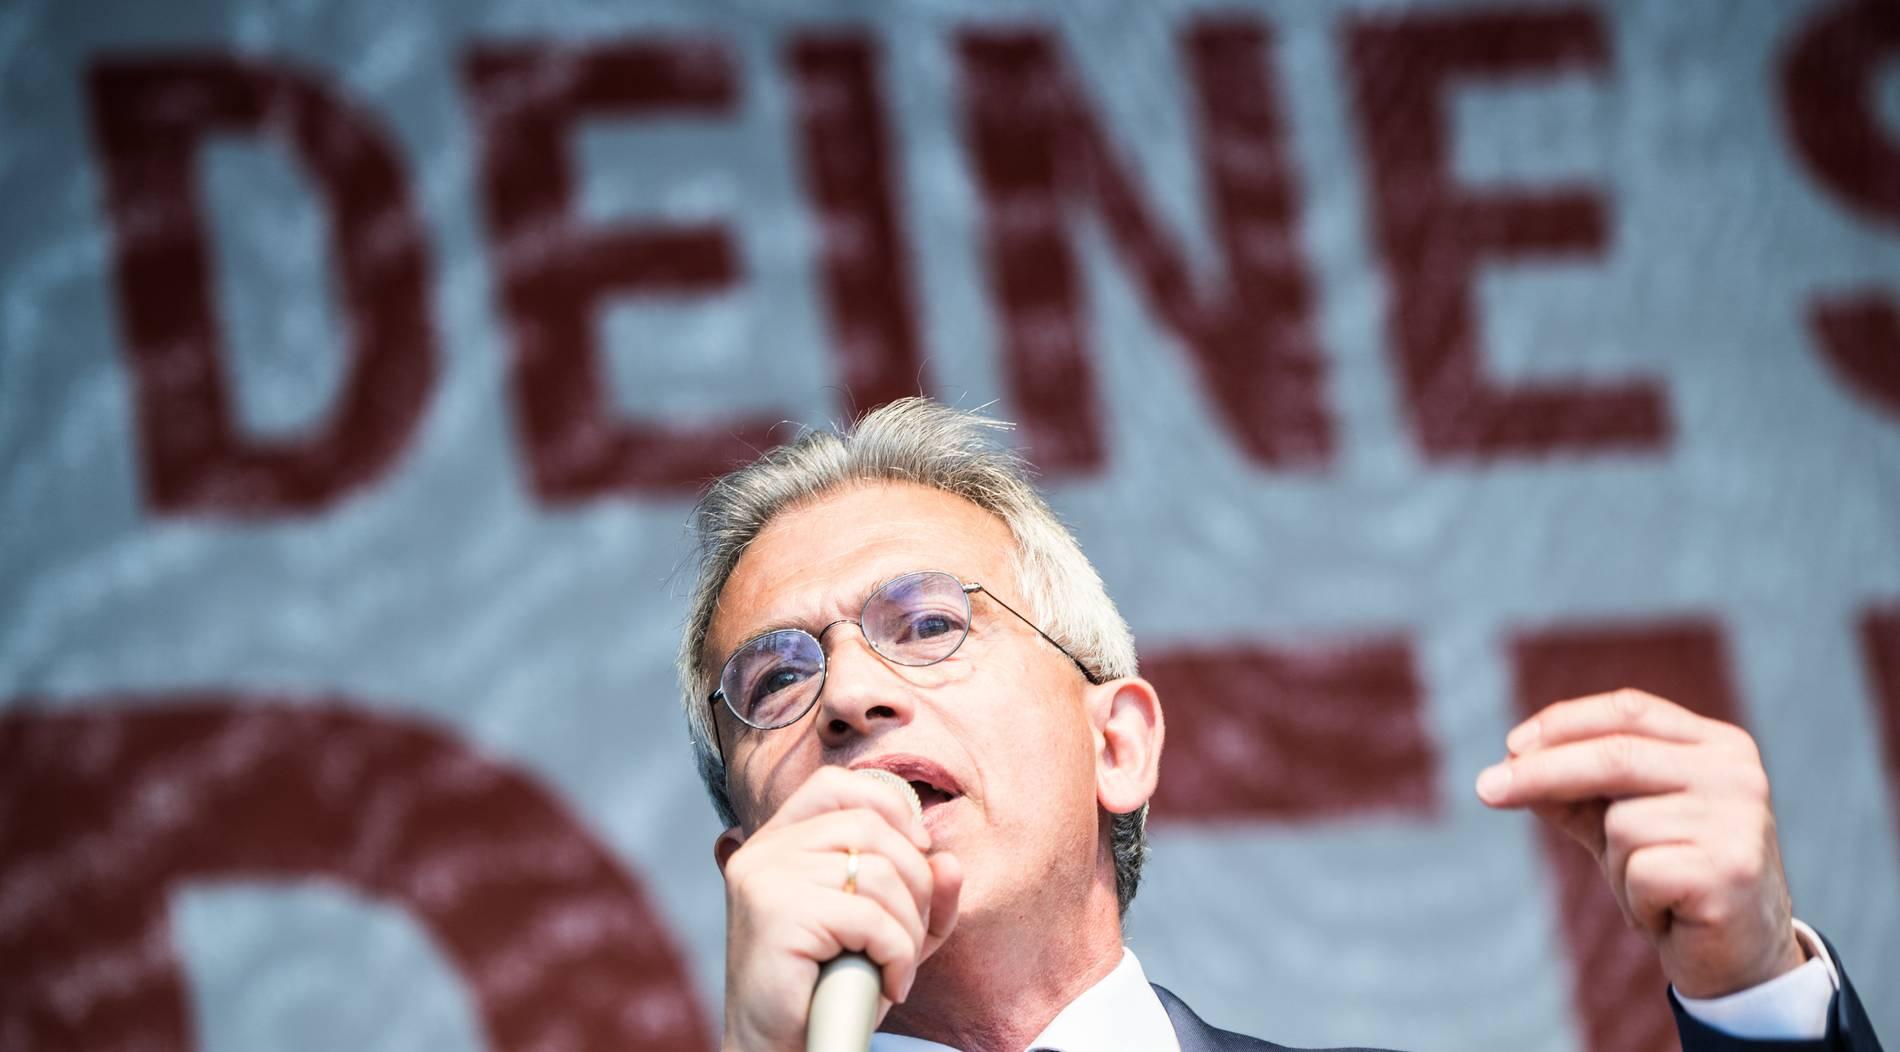 Köln gewinnt Stadtwette - Frankfurter Oberbürgermeister muss zum Karneval